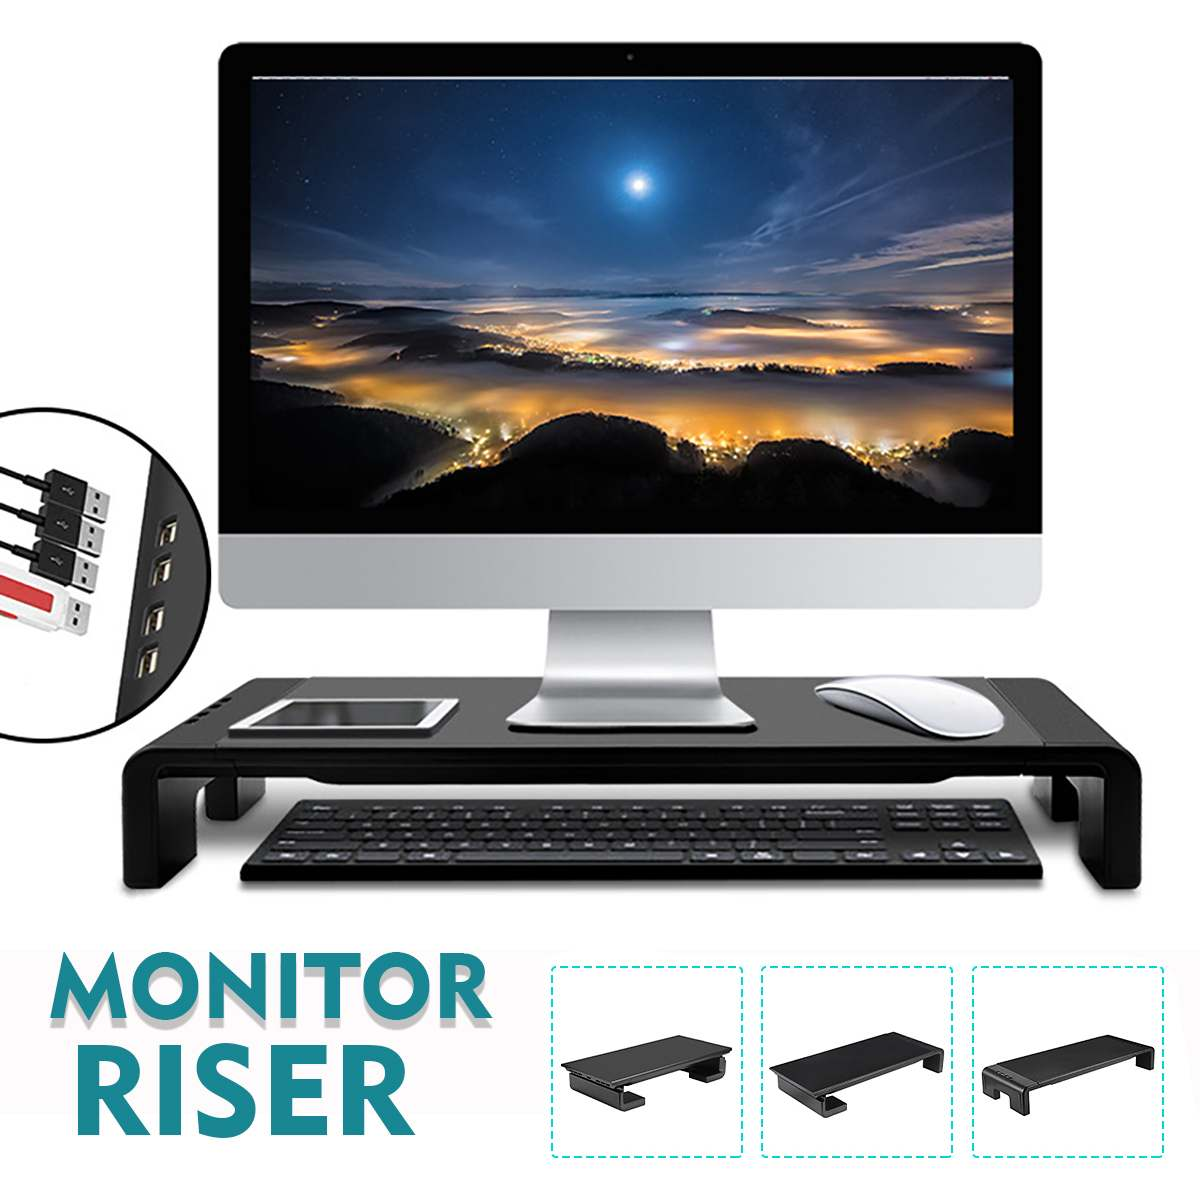 4 USB 2.0 Ports Smart Monitor Riser Multifunction Desktop Computer Screen Shelf Stand Laptop Desk Holder Accessories TV Stand 1